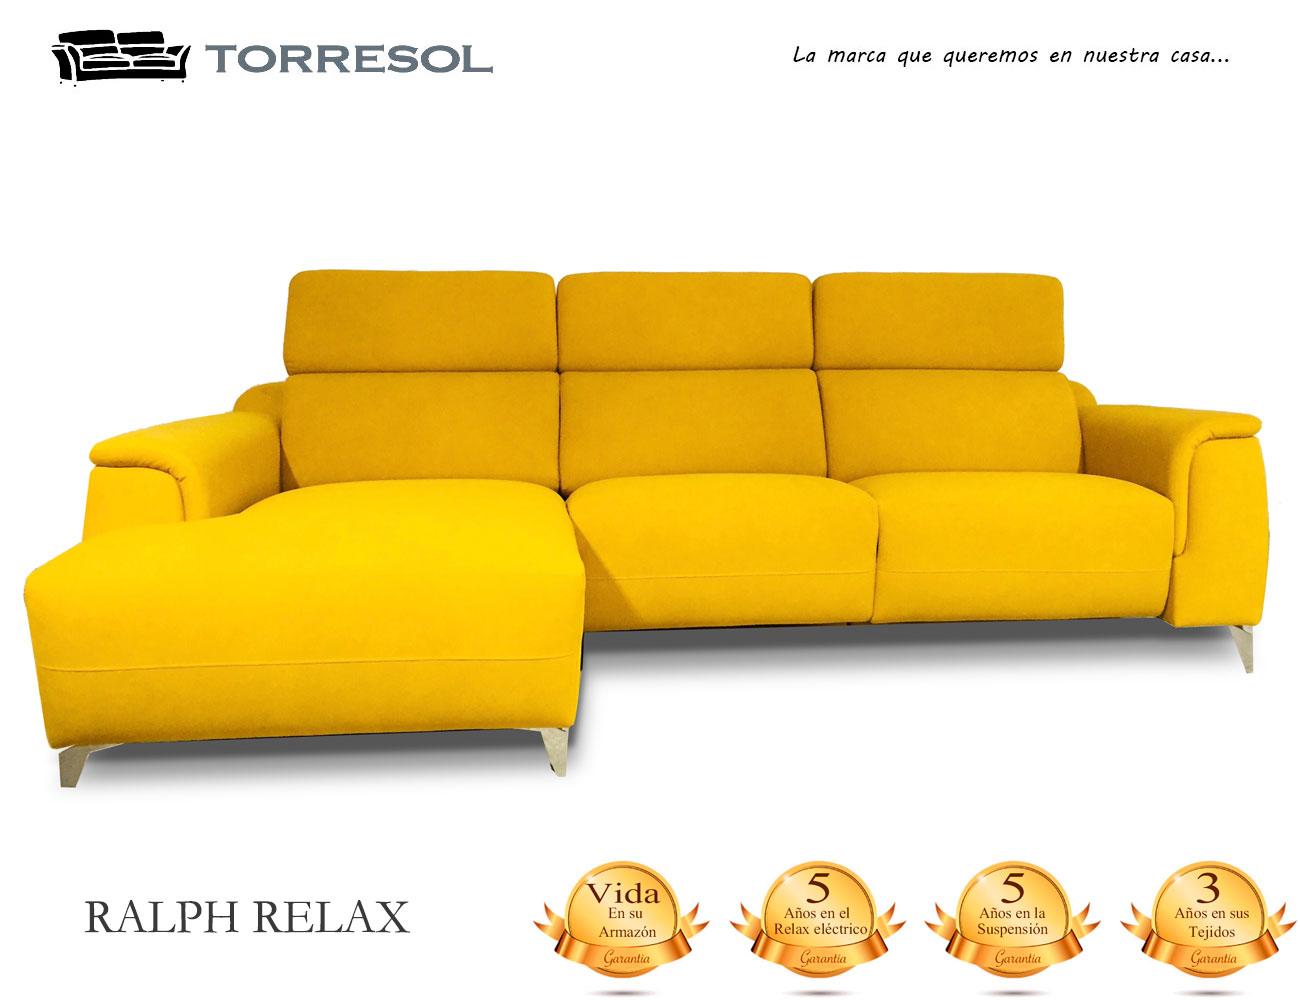 Sofa ralph torresol